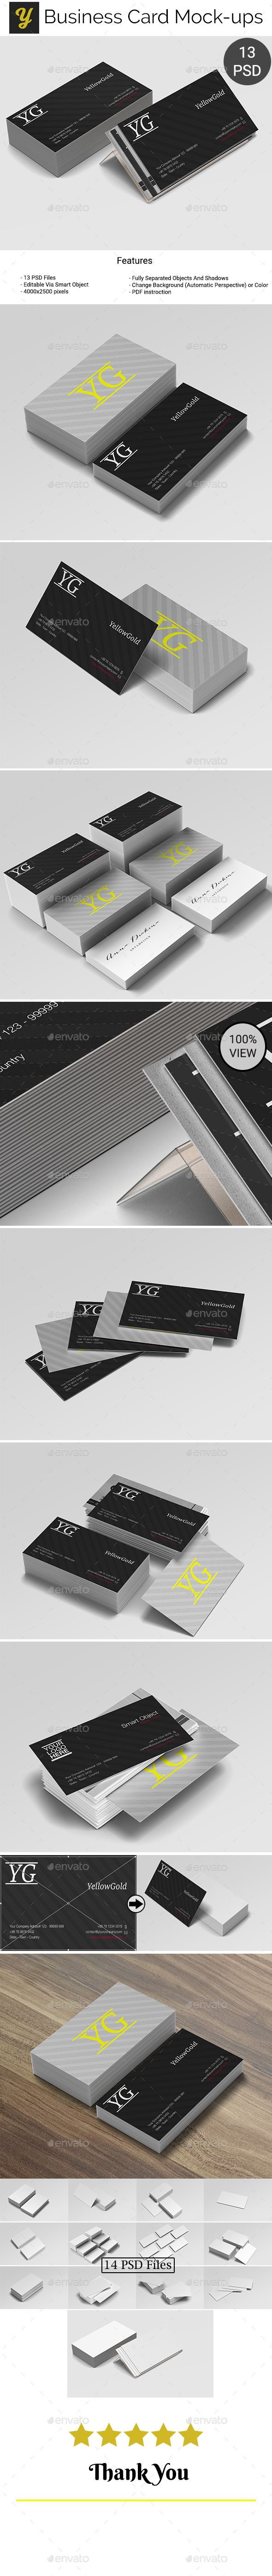 Business card mock ups business cards mockup and card printing colourmoves